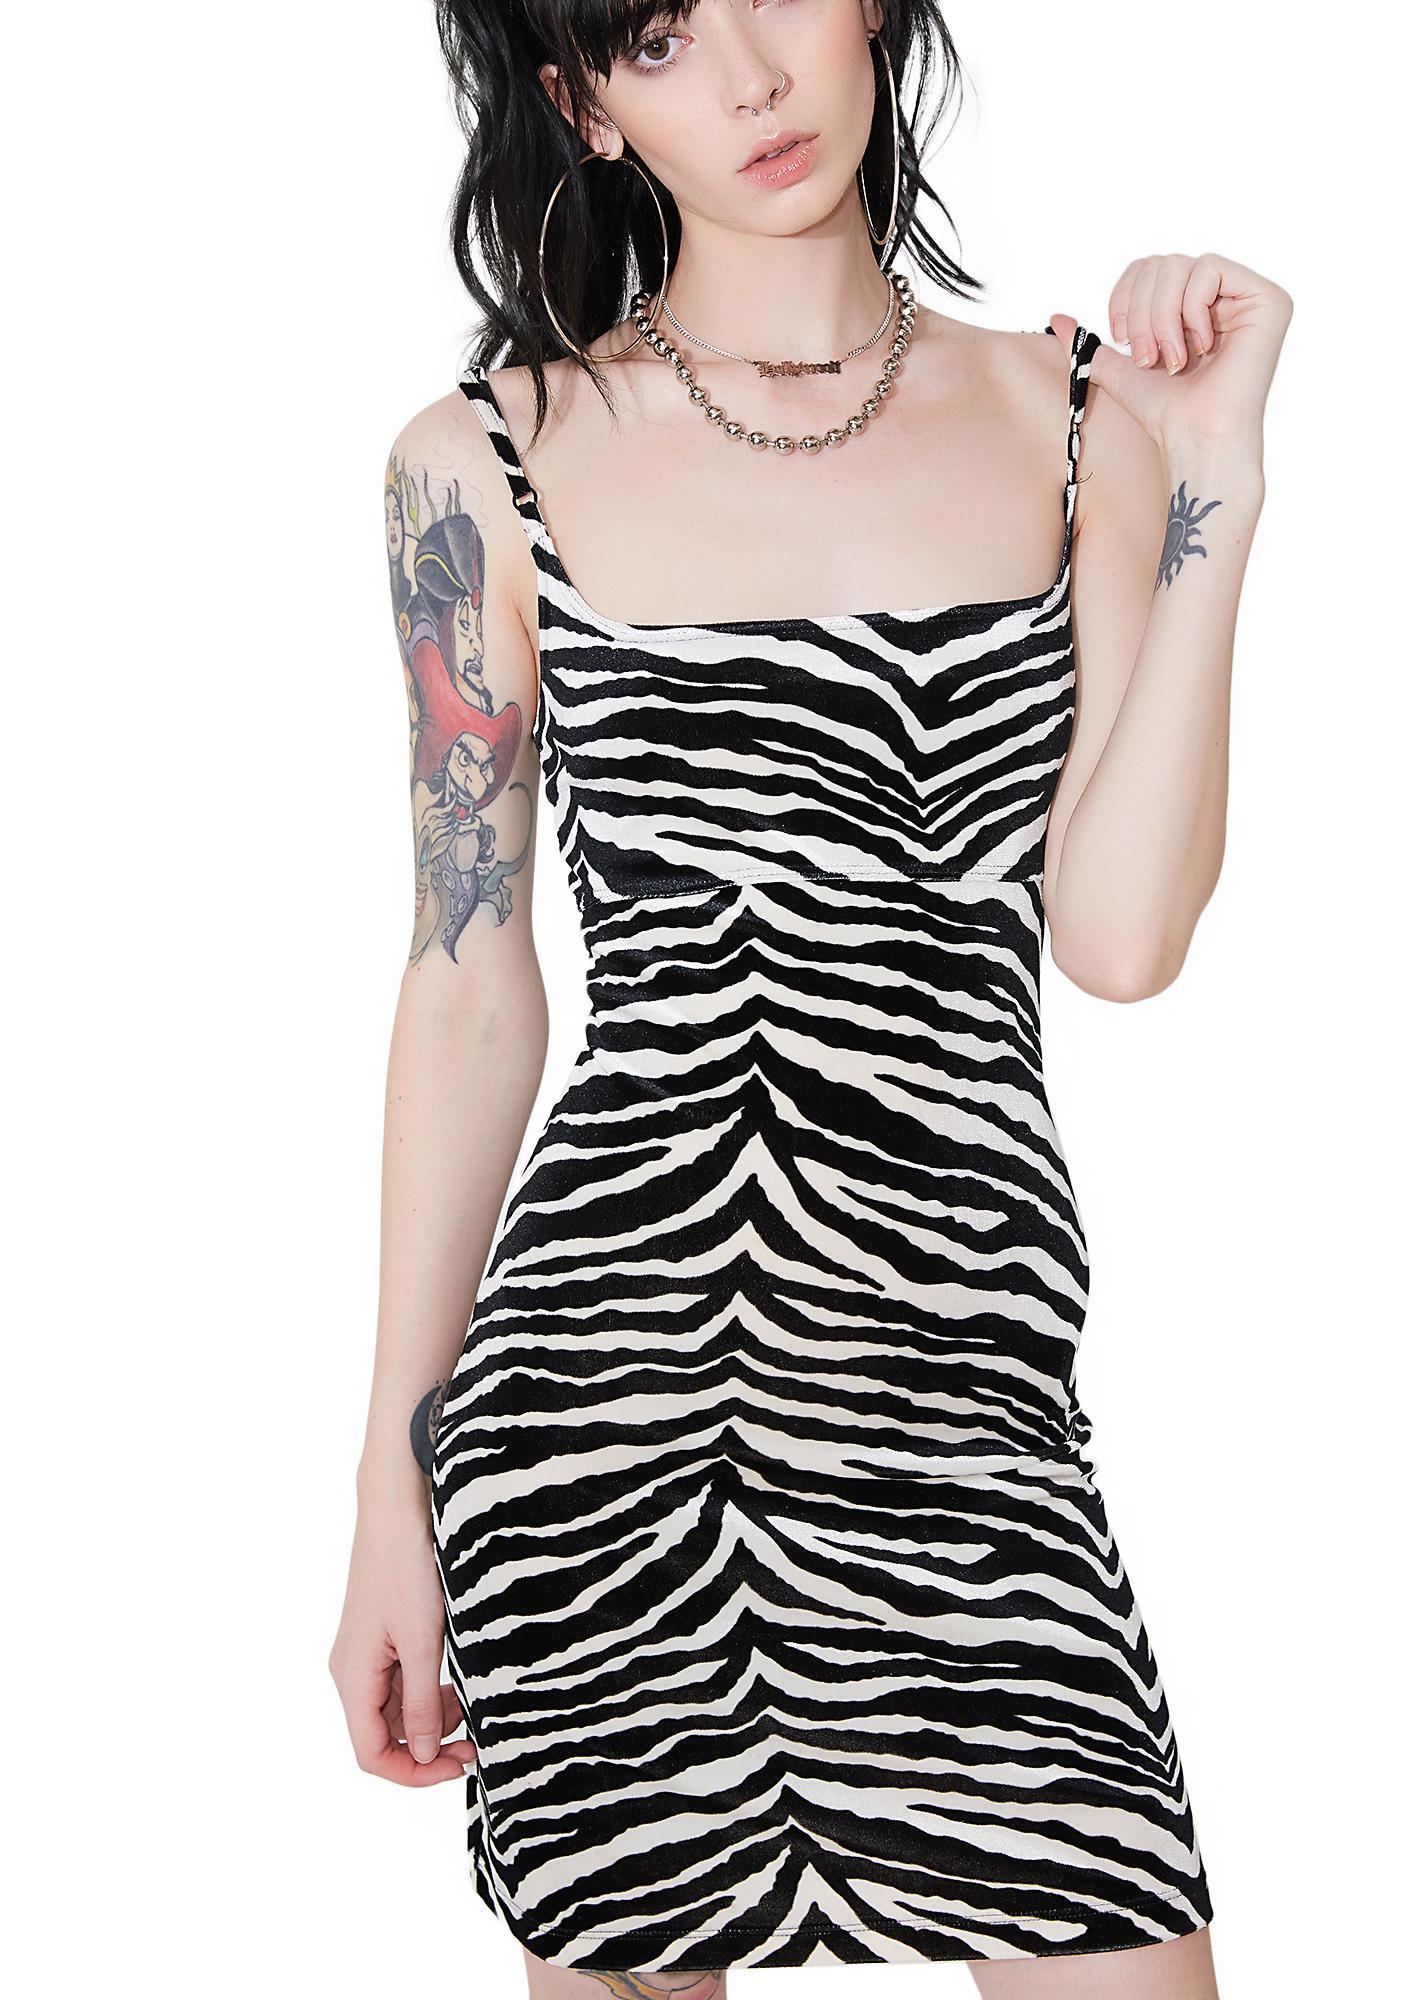 Vintage Zebra Bodycon Dress